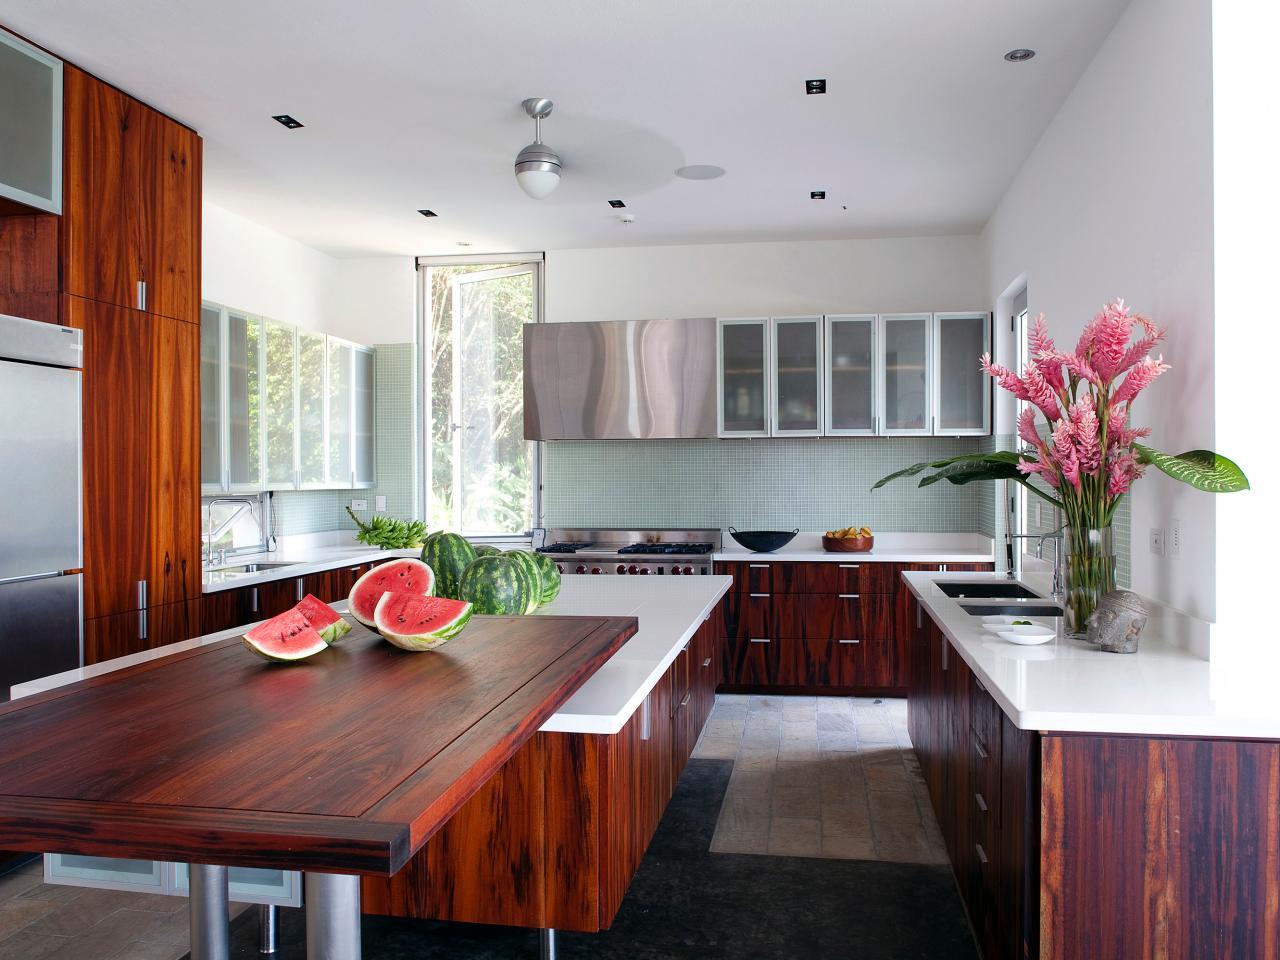 Uncategorized Wood Kitchen Countertops wood kitchen countertops hgtv inspired examples of countertops